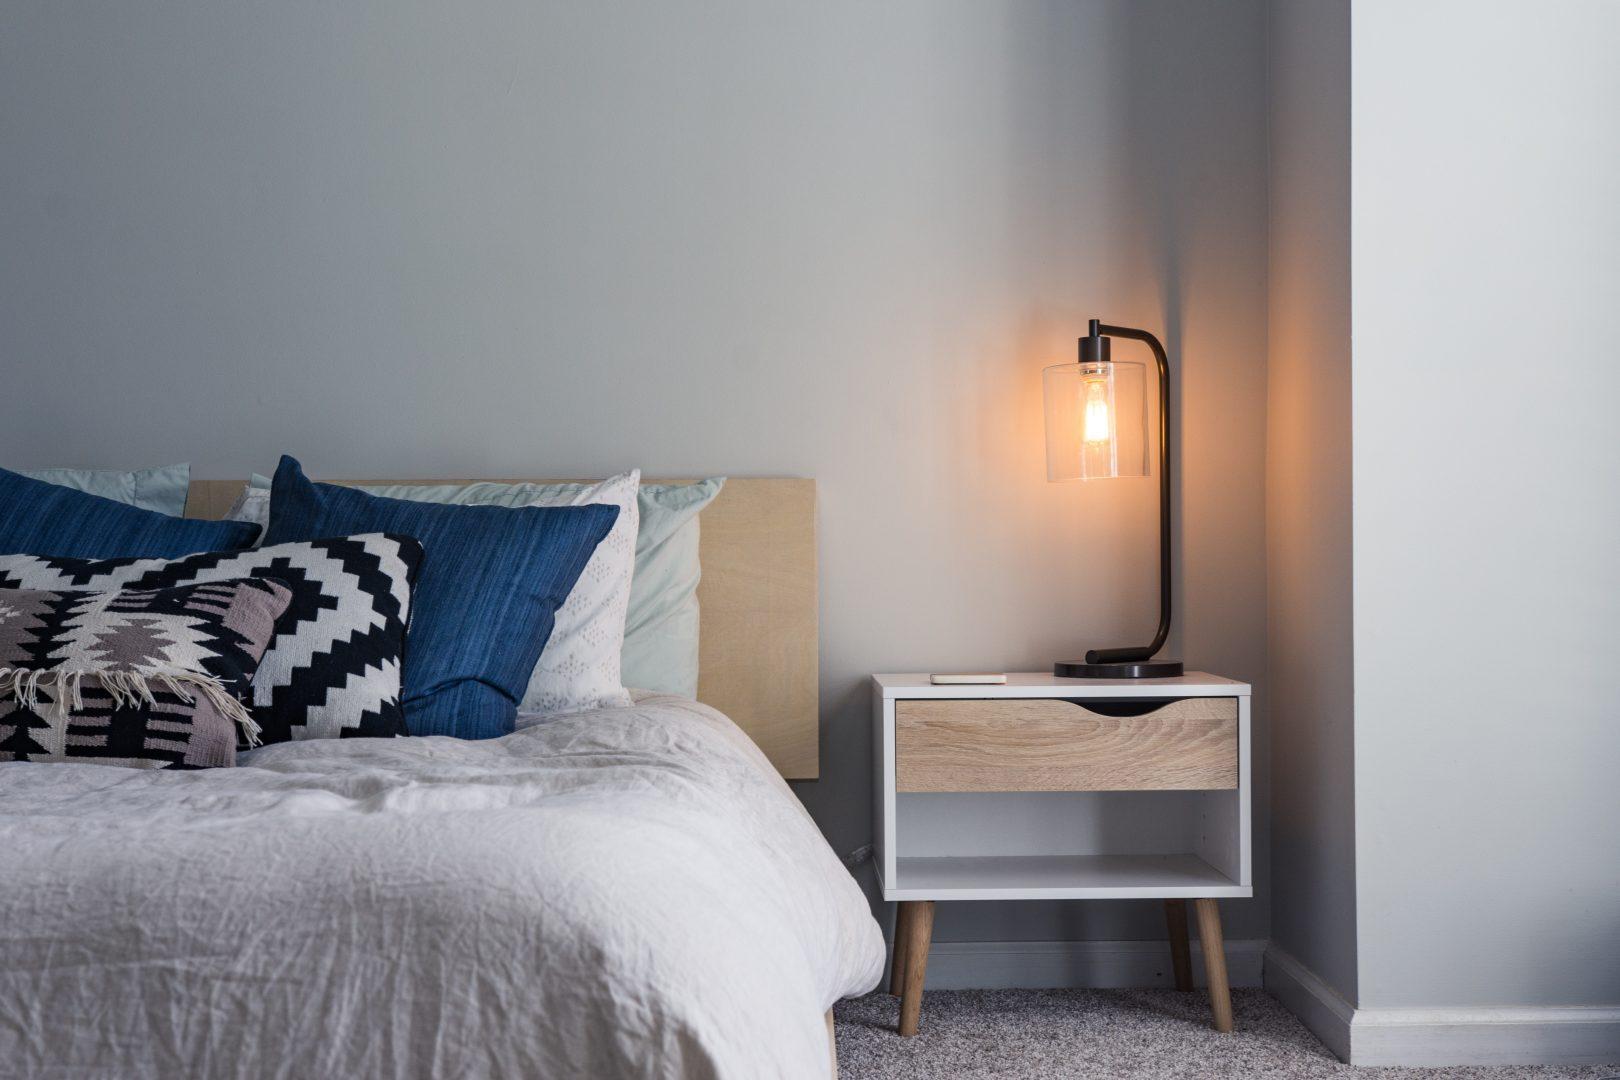 slaapkamer tapijt met warmup vloerverwarming